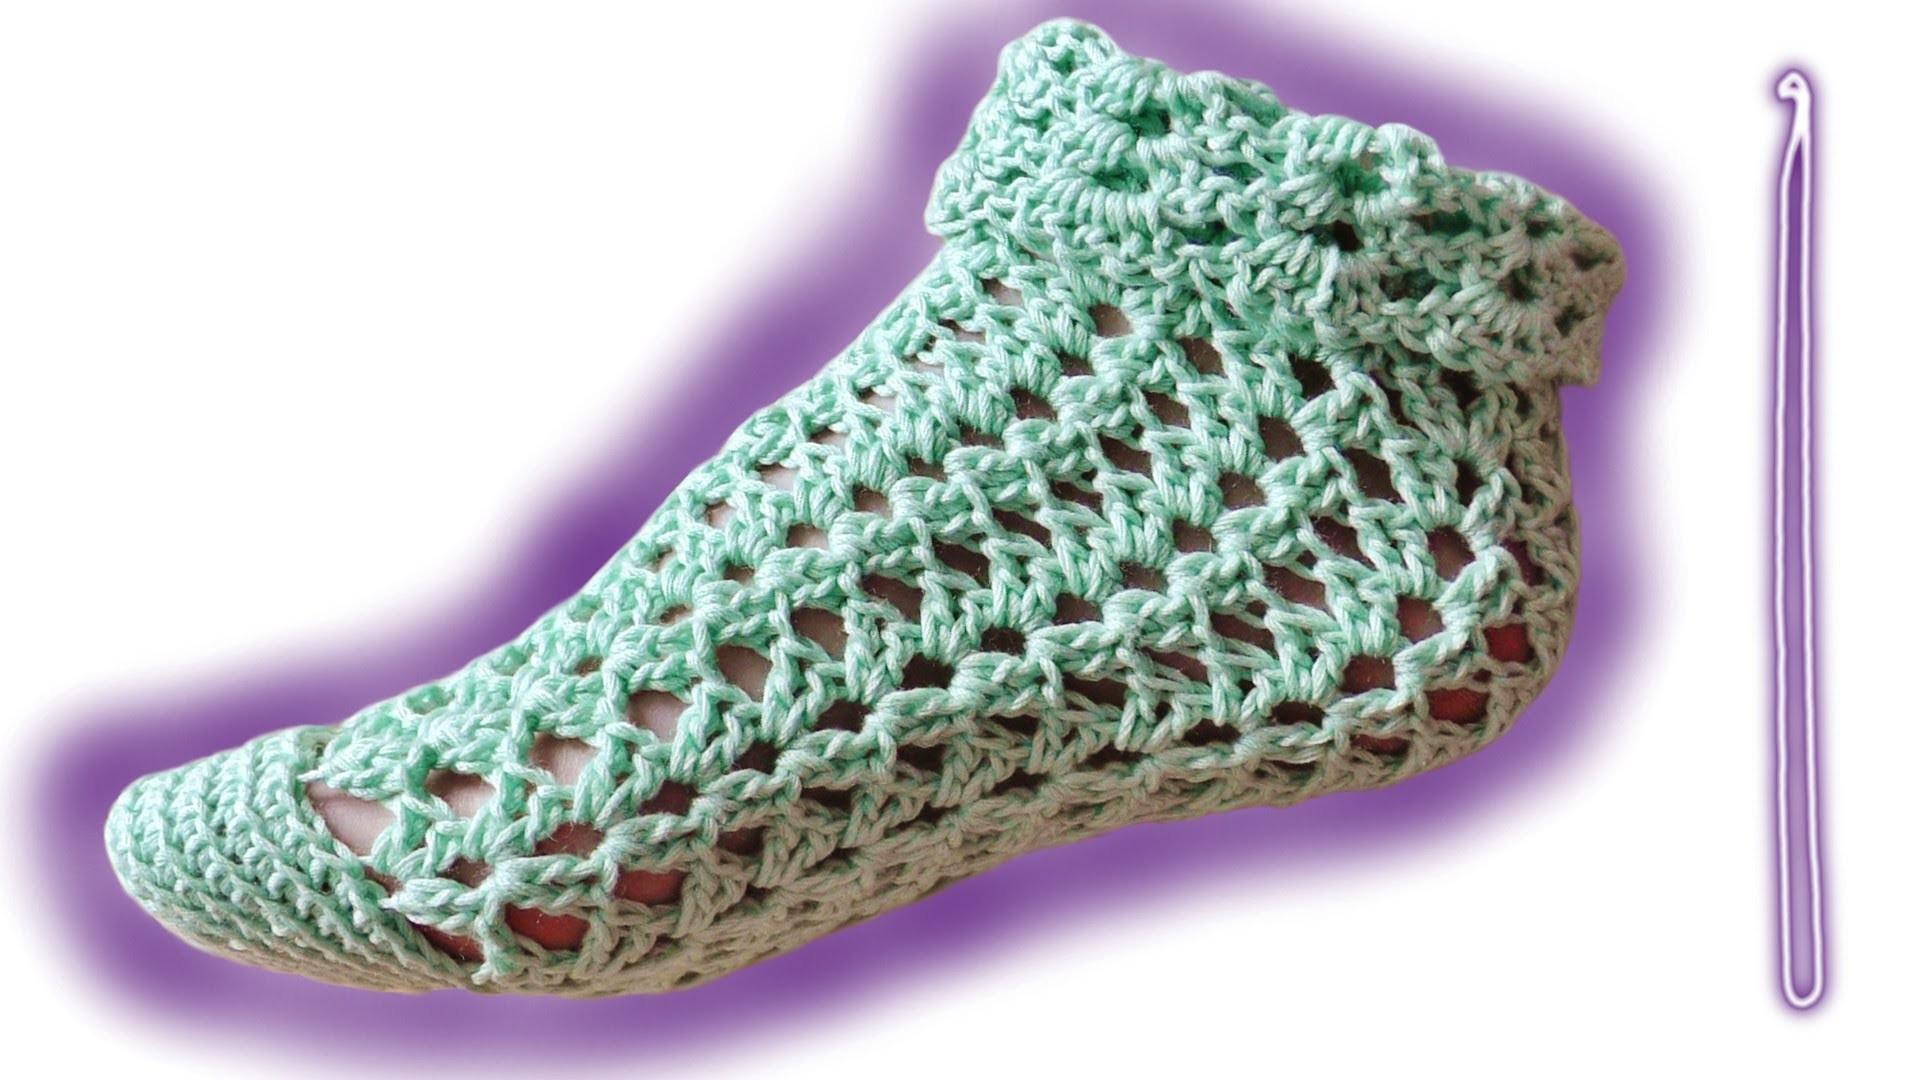 Summer socks advanced crochet tutorial - Woolpedia